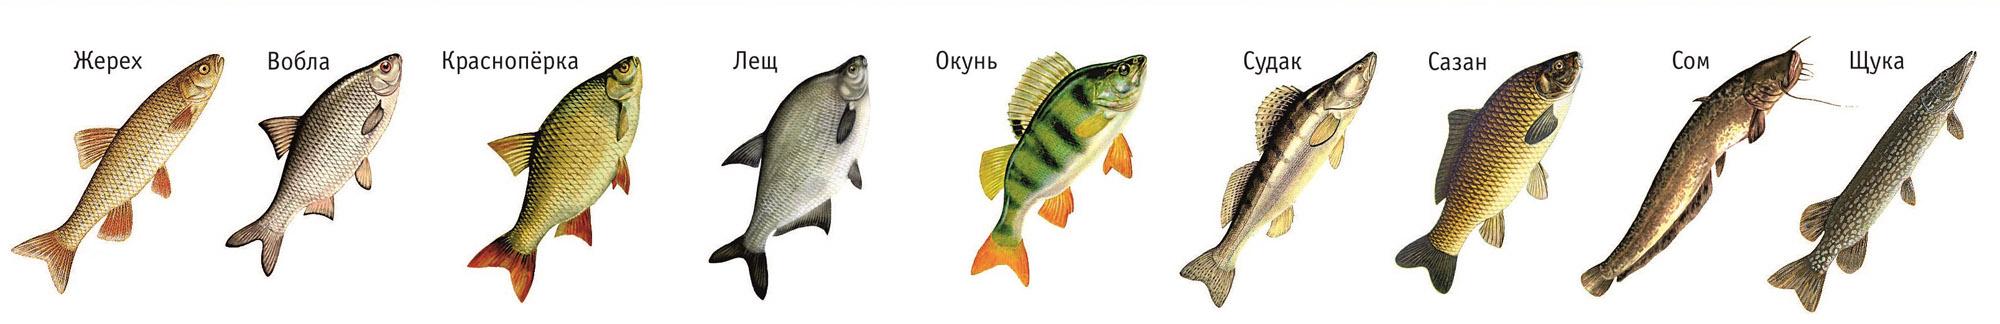 на что клюет рыба в июне